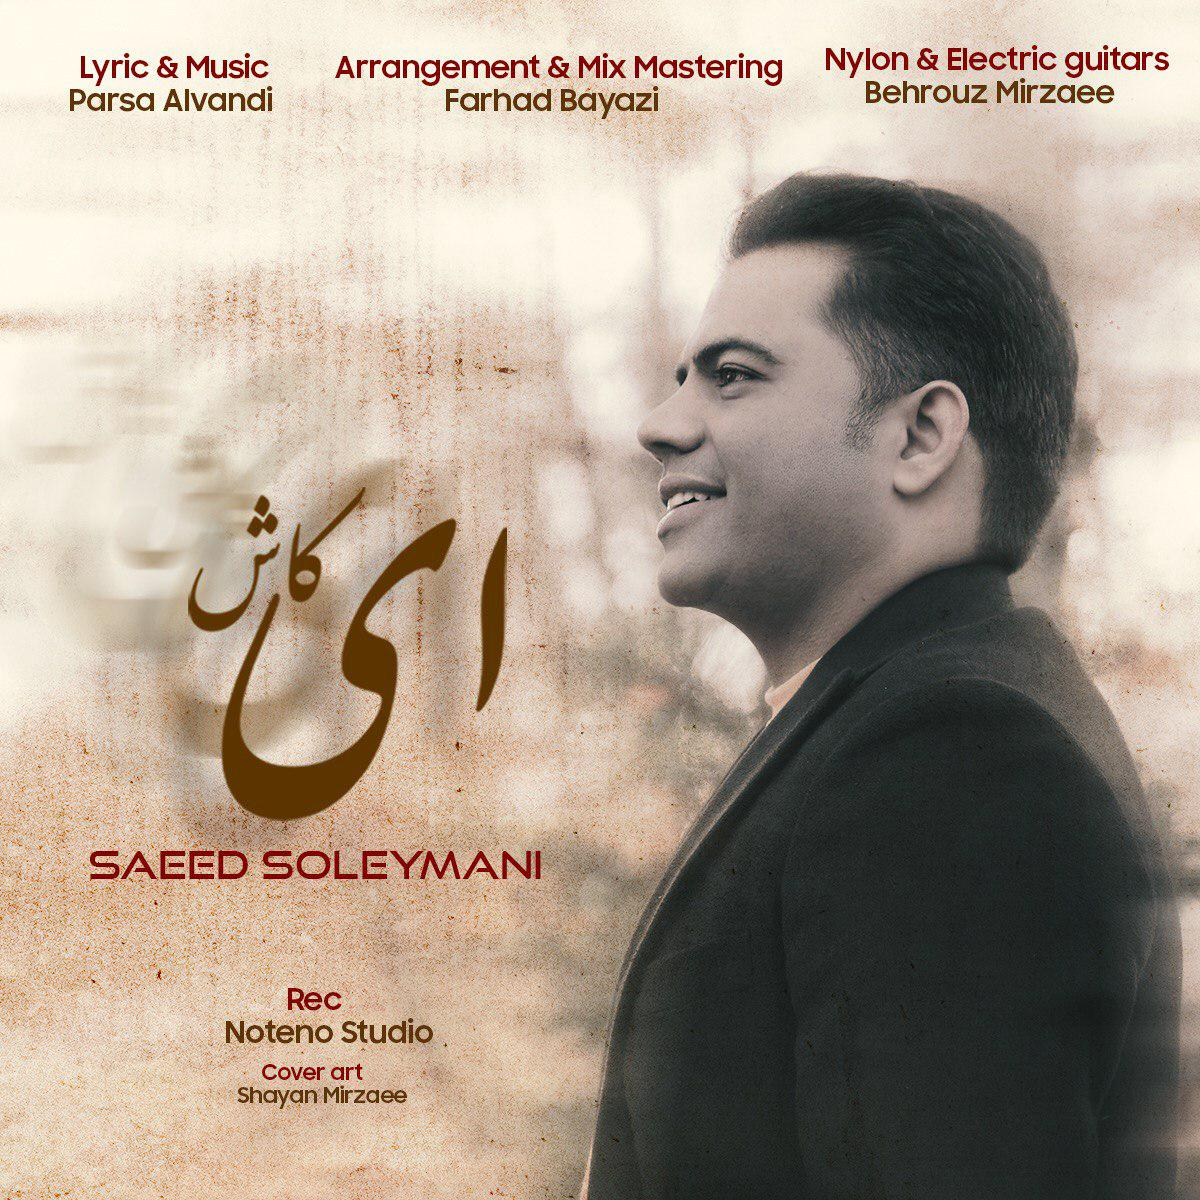 Saeed Soleymani – Ey Kash